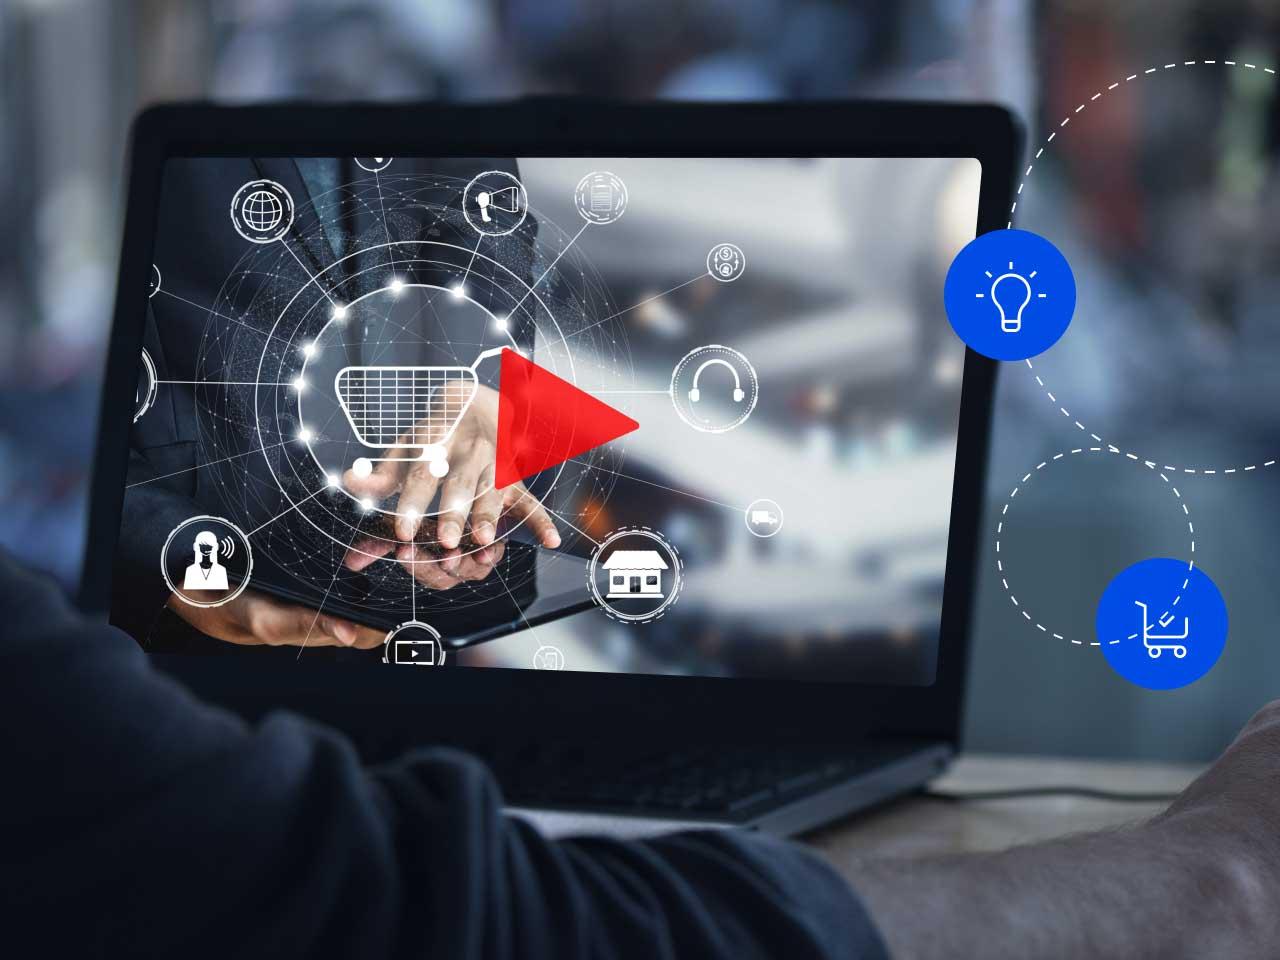 What's Next? Beyond ATG, Hybris, IBM Websphere eCommerce Platforms